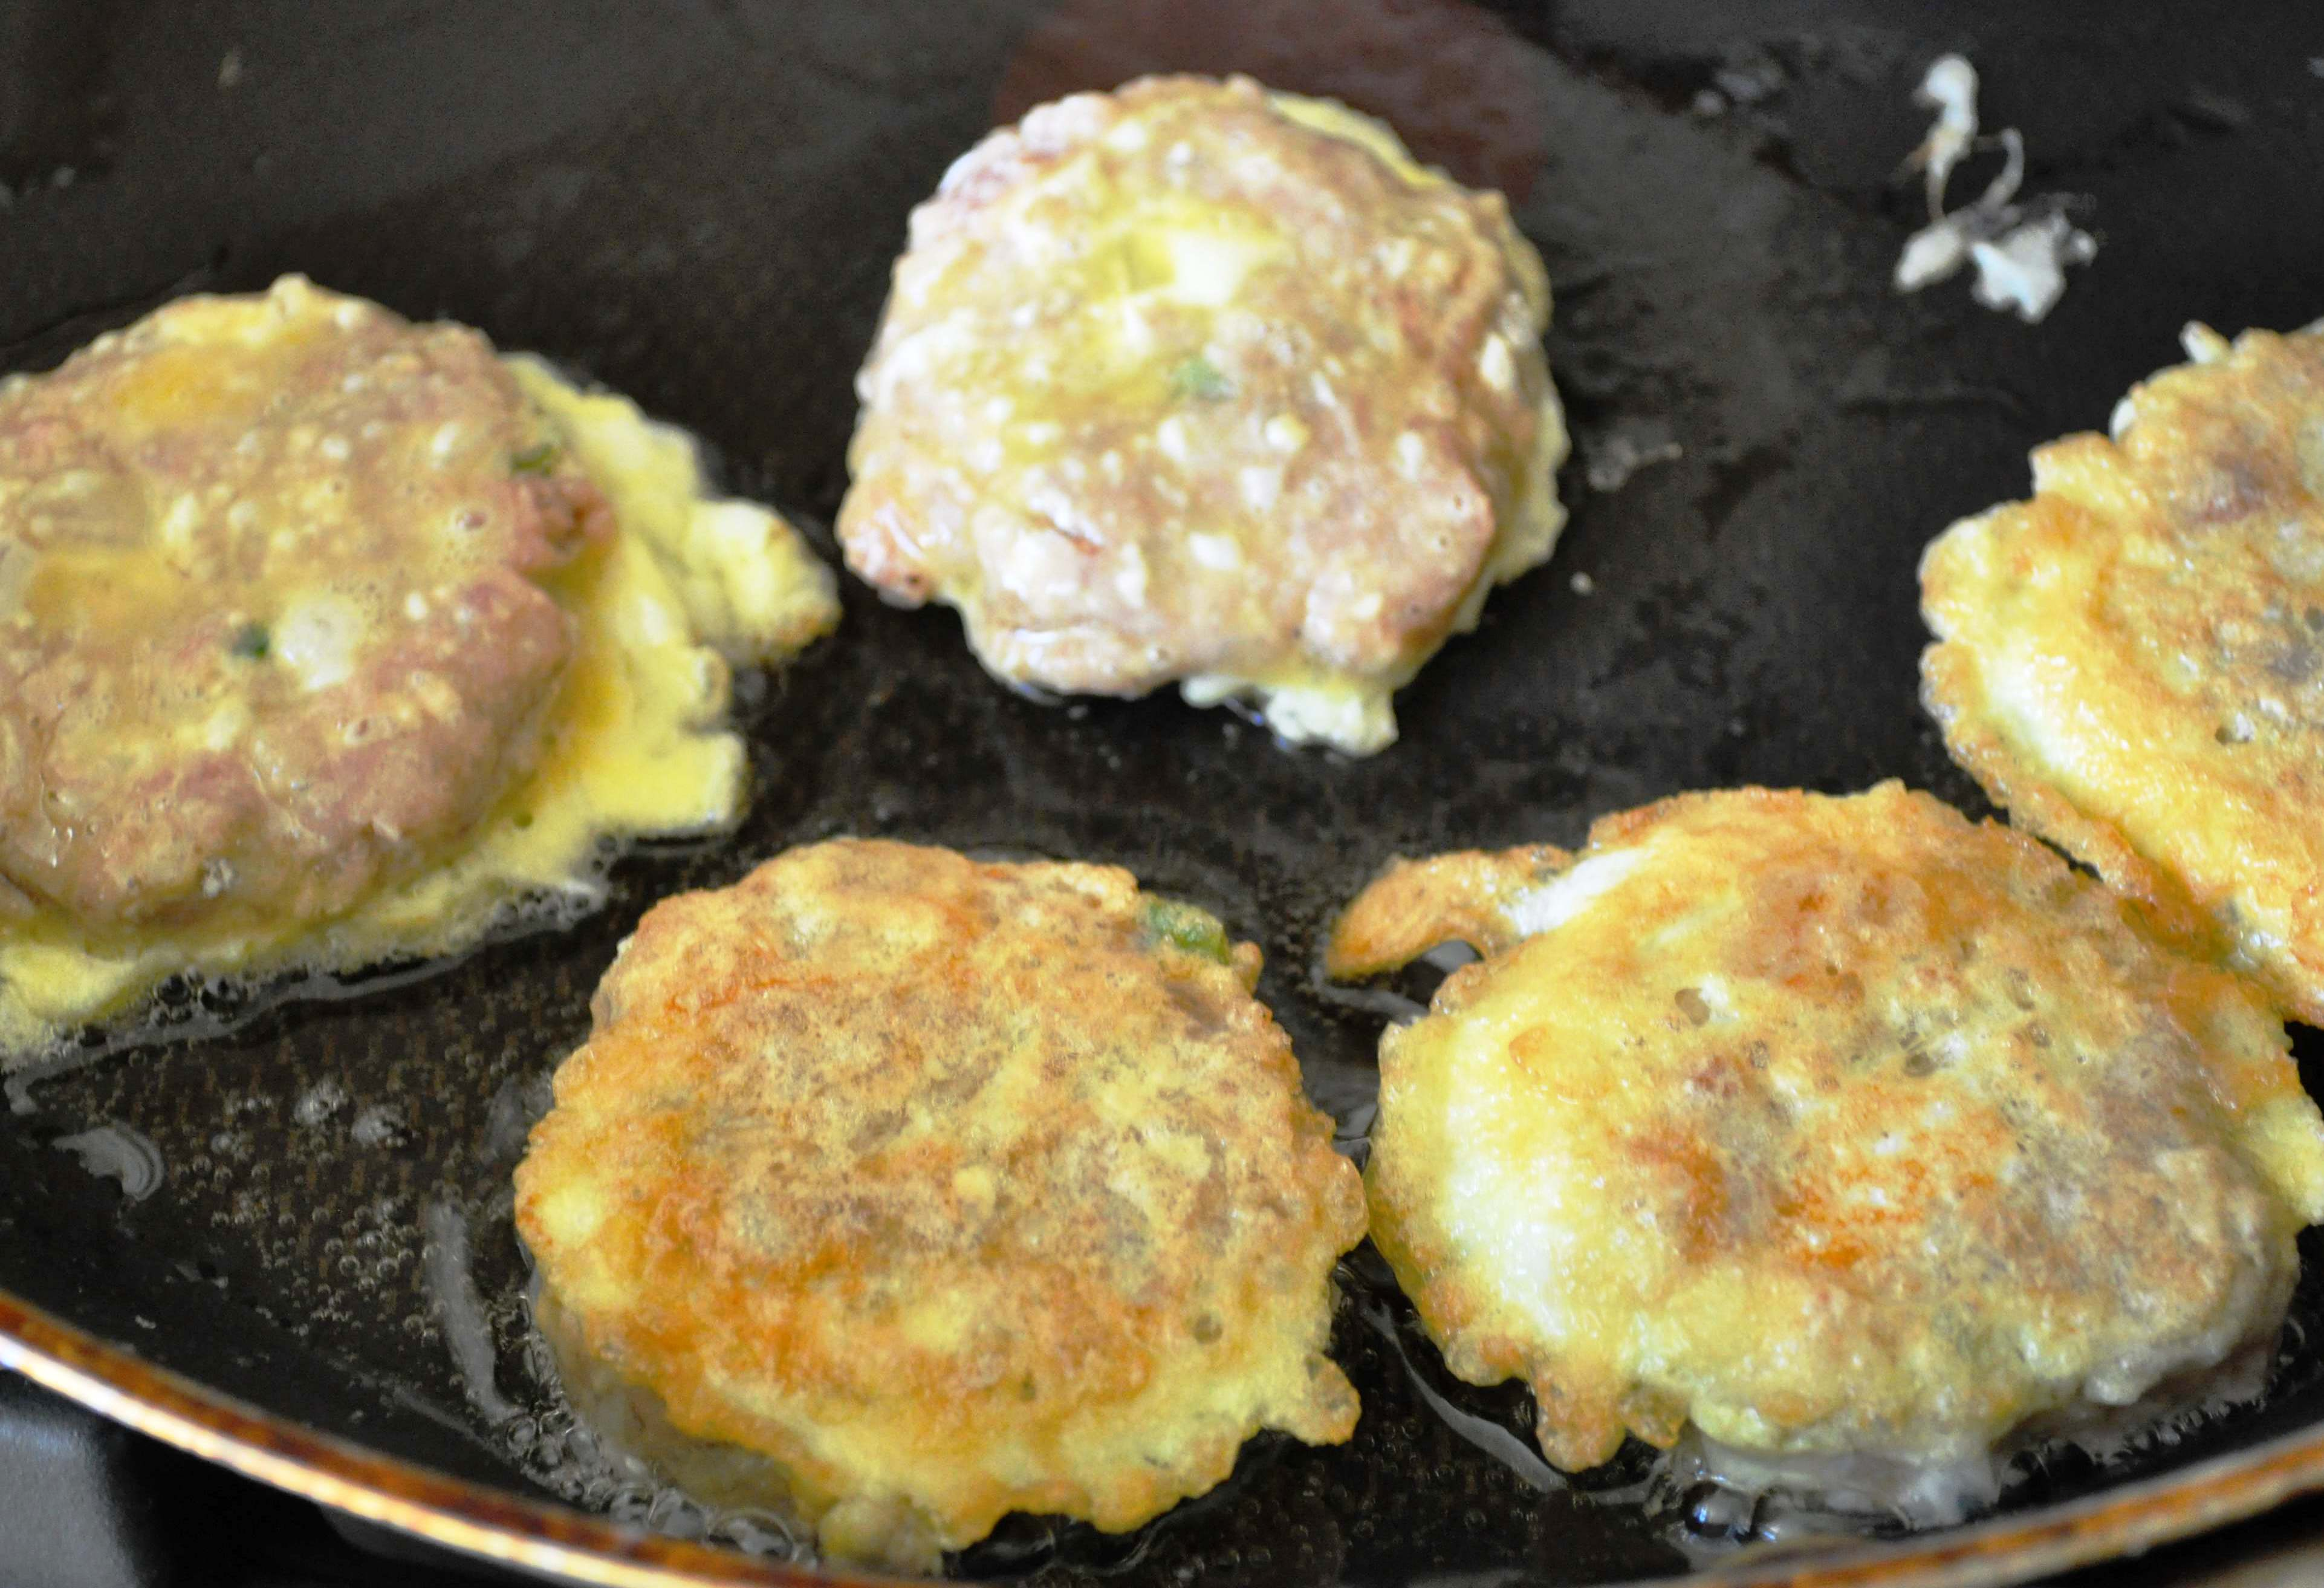 Wanja jeon in frying pan